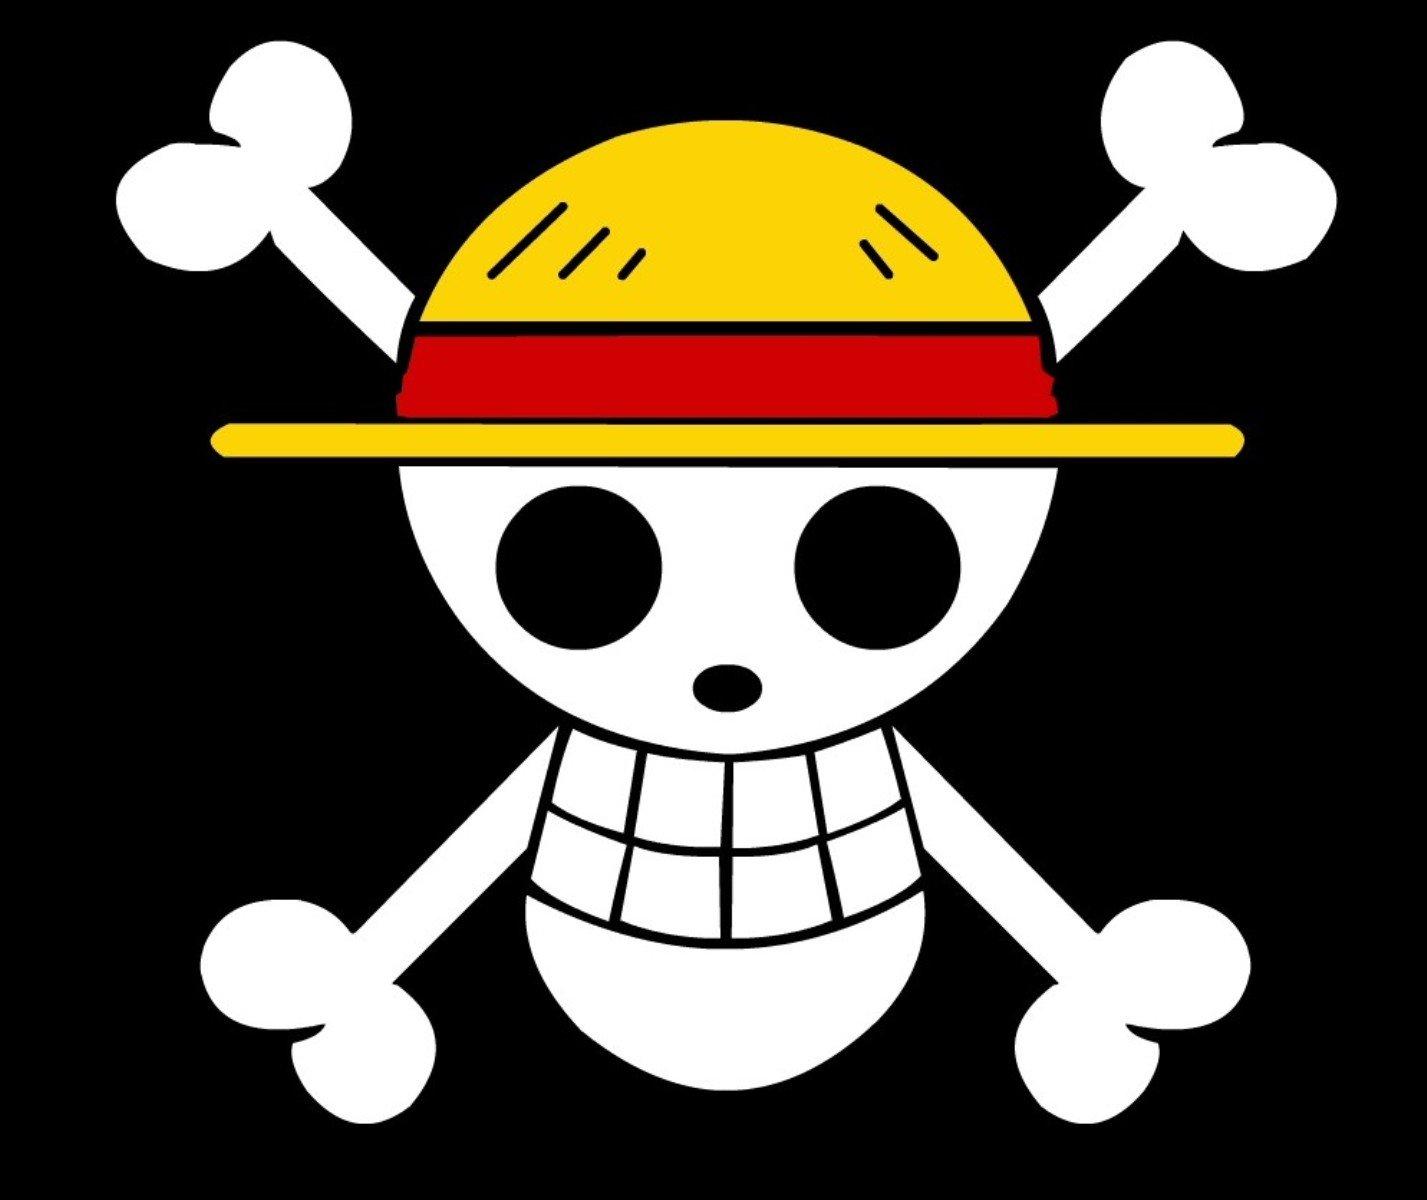 One Piece Logo Pirate Wallpaper Download Anime One Piece Logo 1427x1200